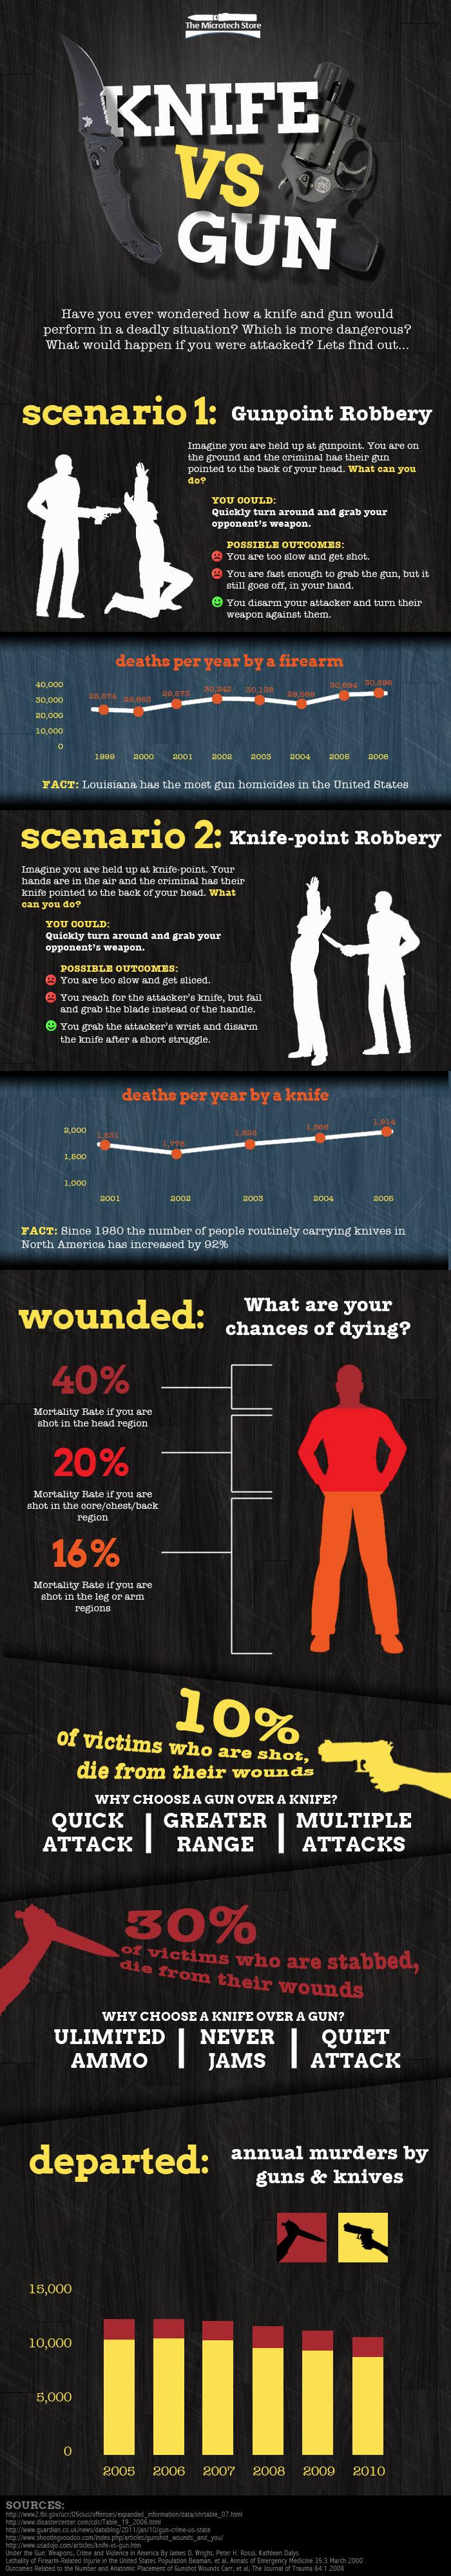 Knife VS Gun: Which Is More Dangerous?